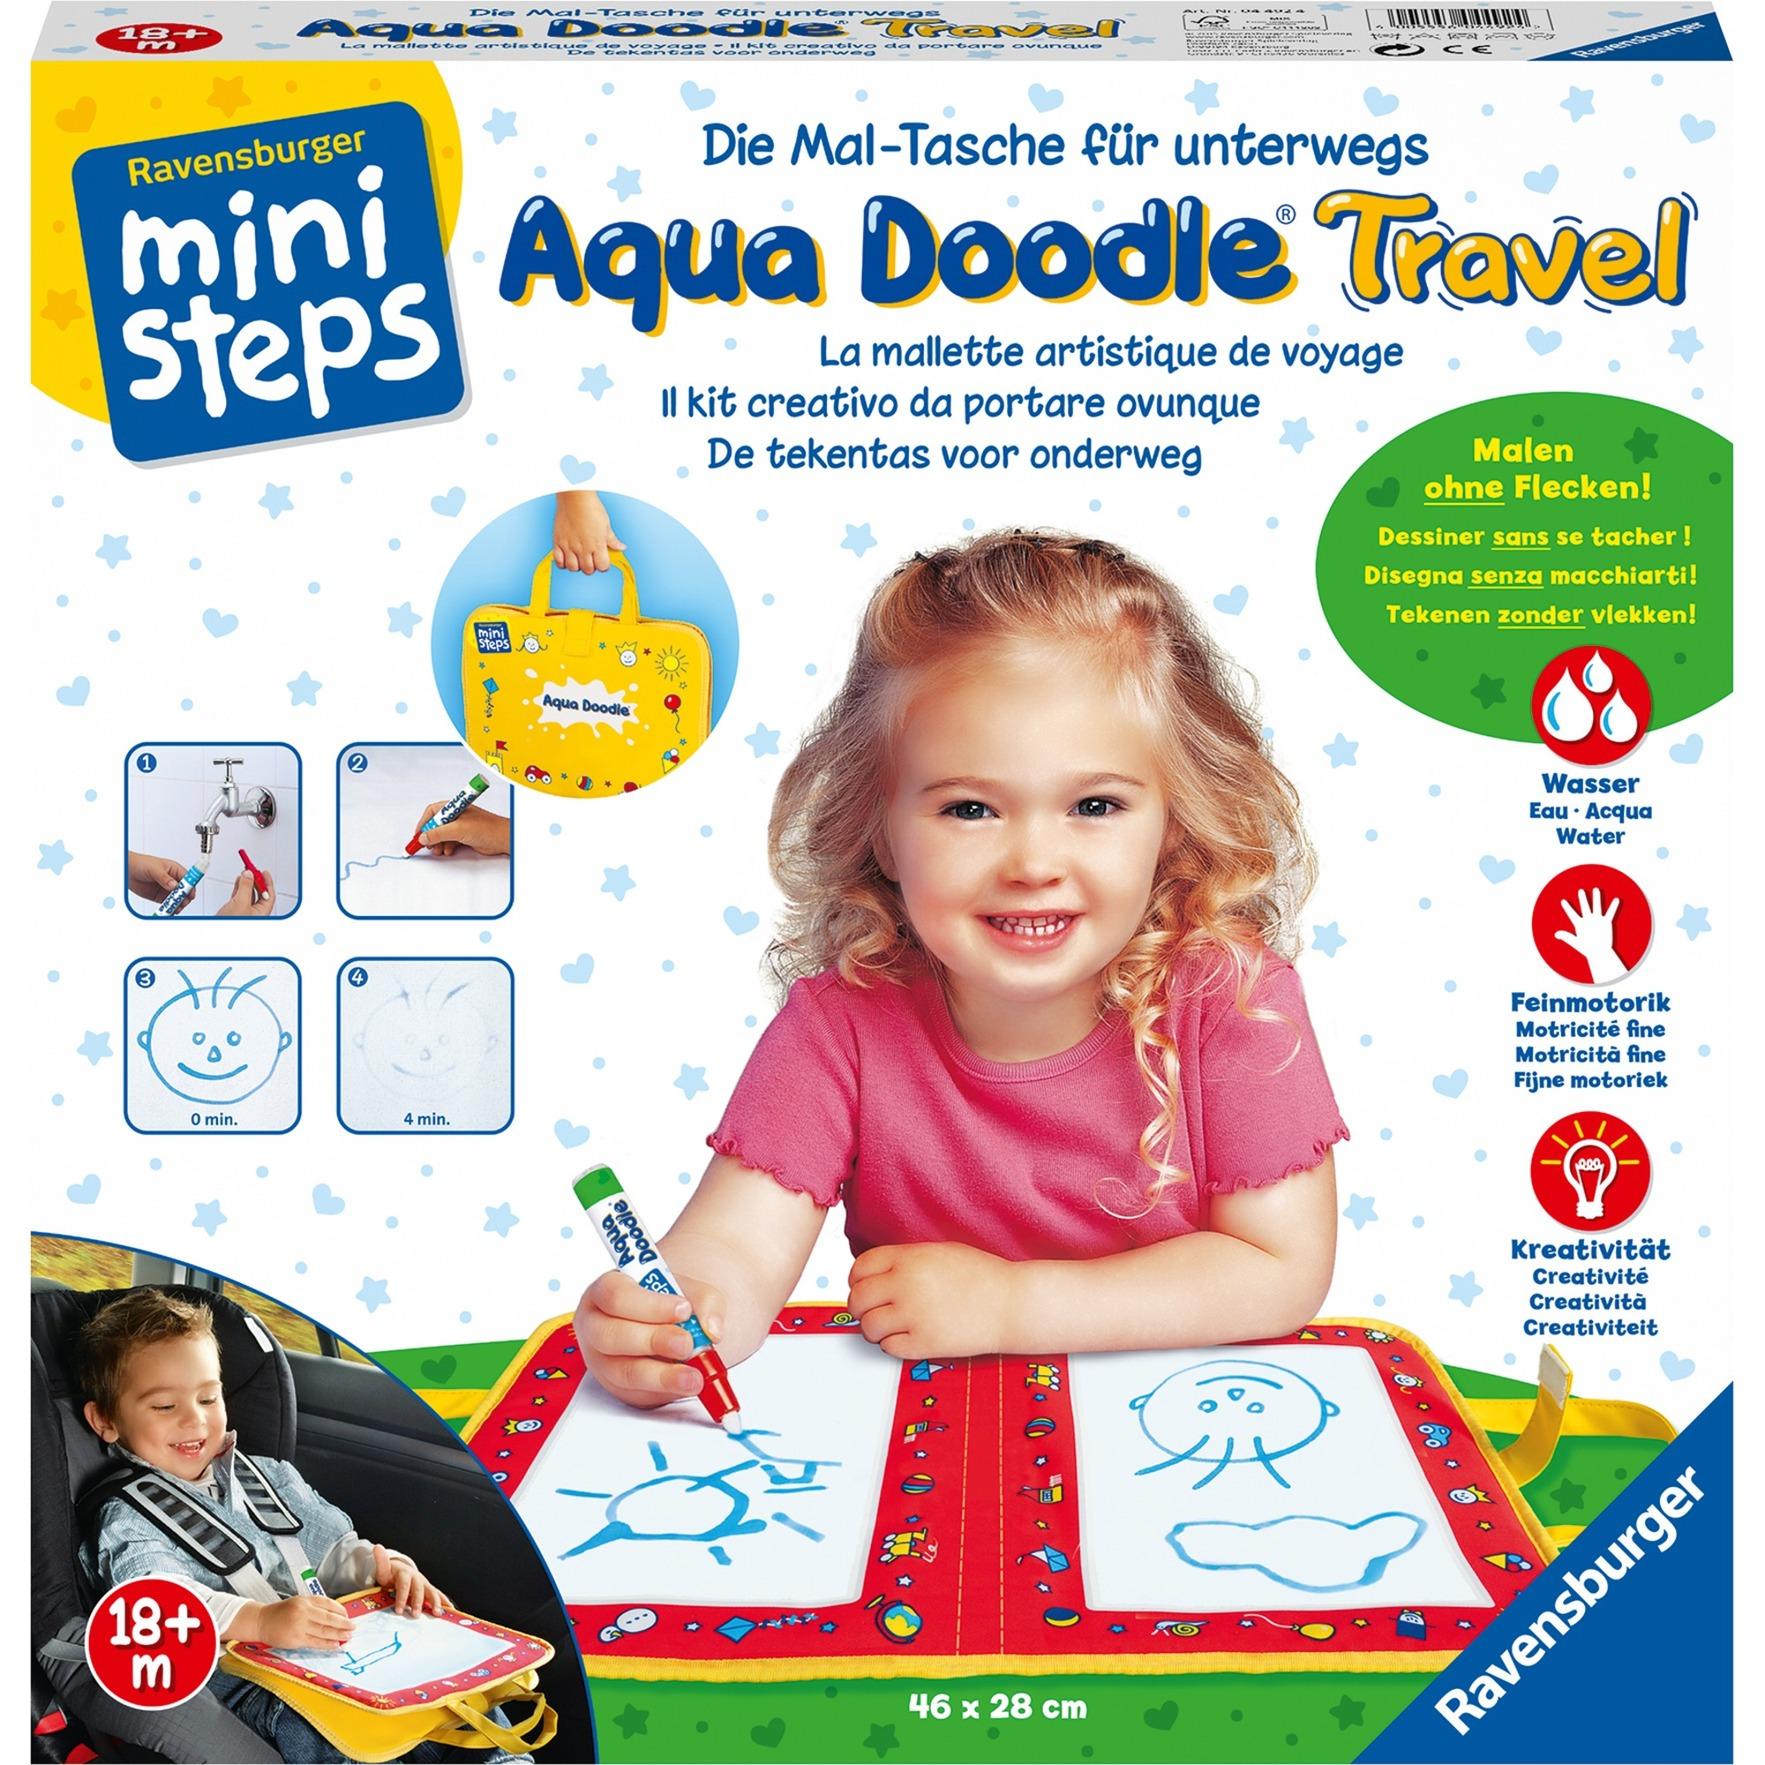 ministeps-aqua-doodle-travel-maling